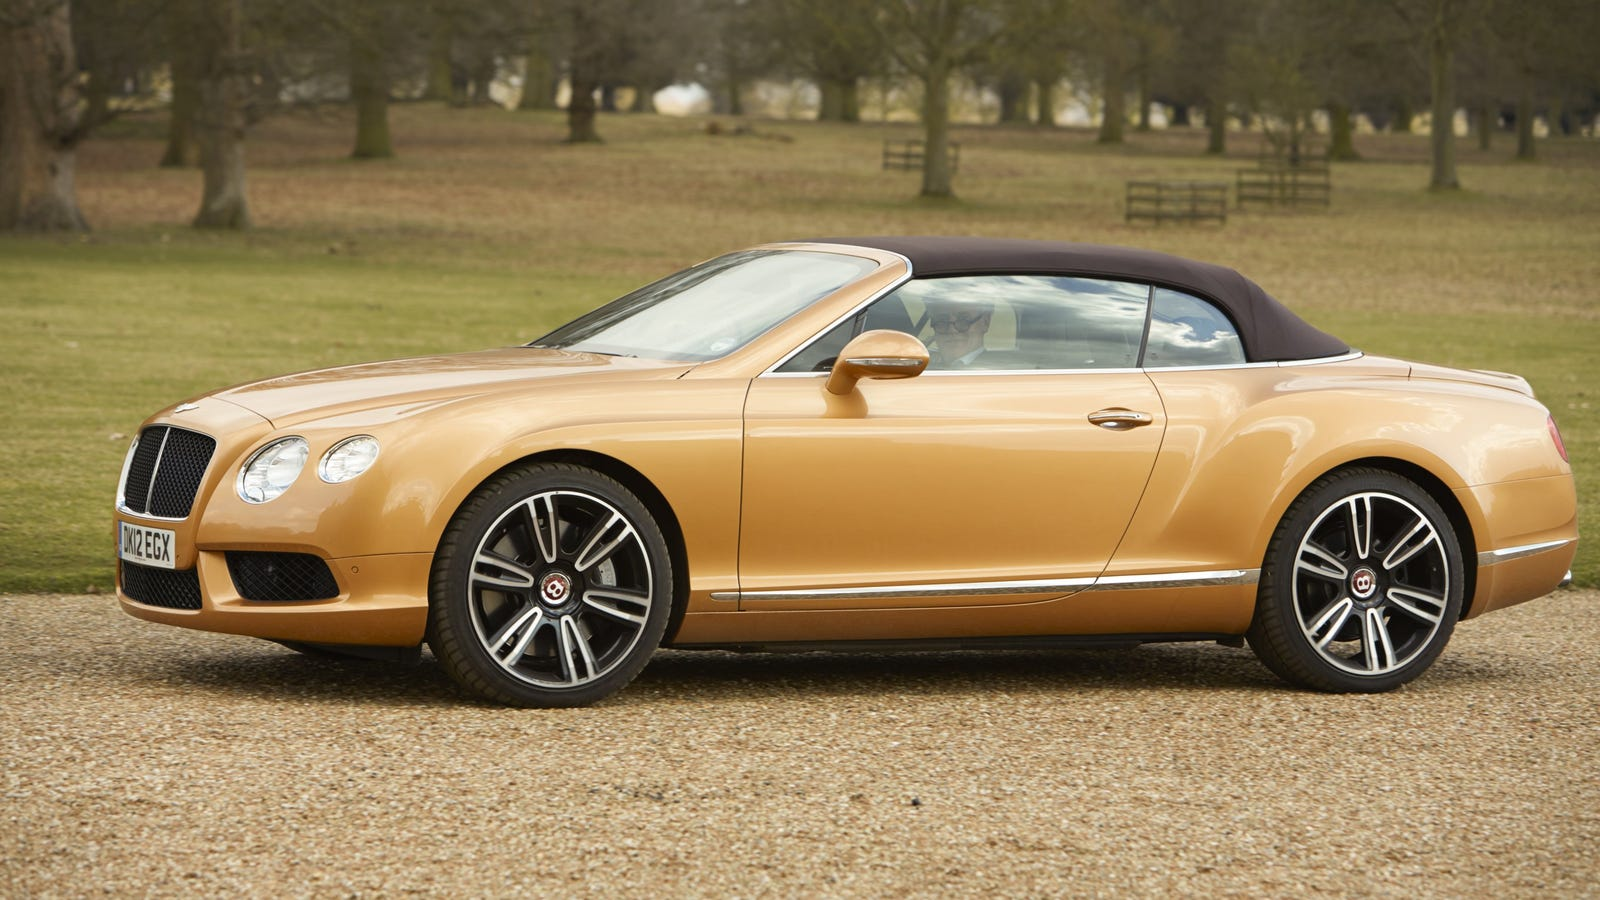 Bentley continental gtc v8 the not so jalopnik review vanachro Gallery